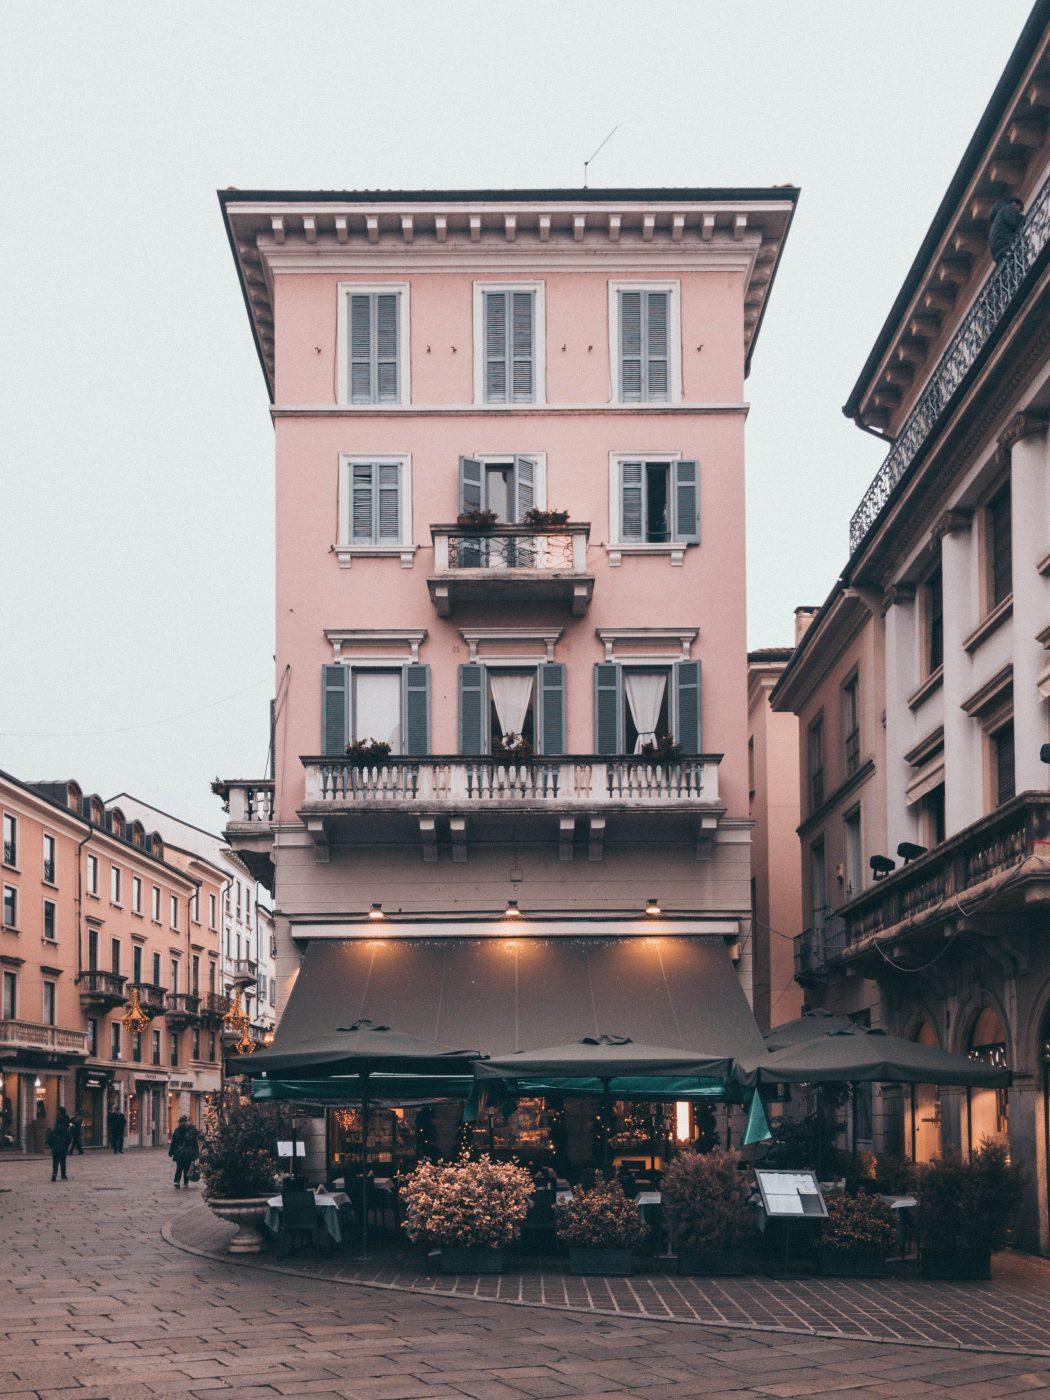 Monza, Lombardy, Lombardia